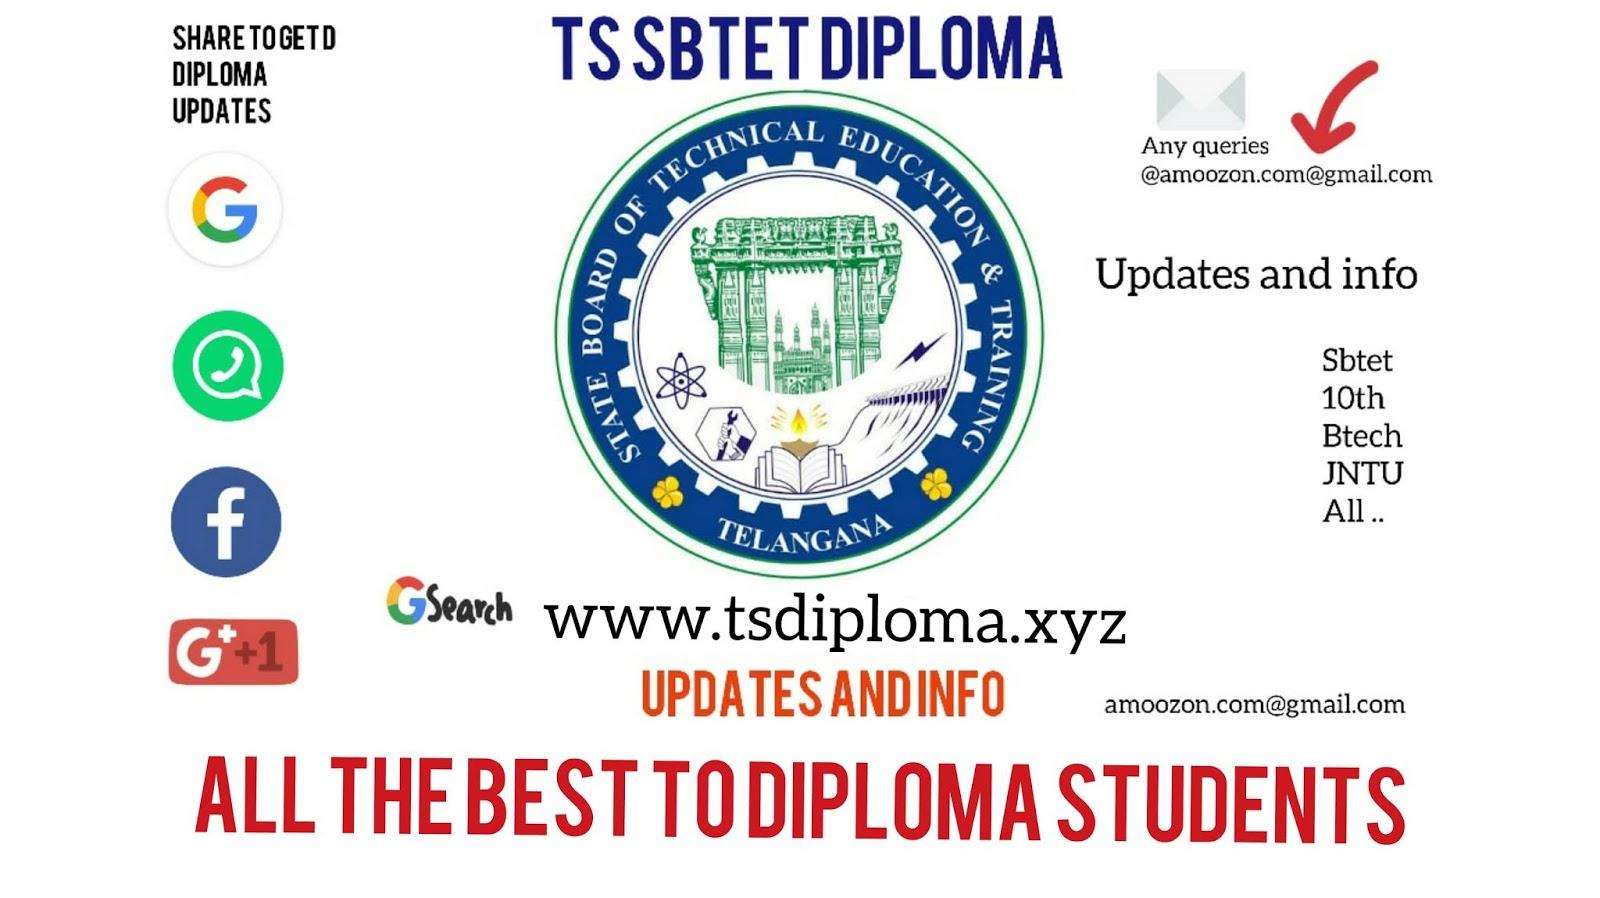 diploma updates